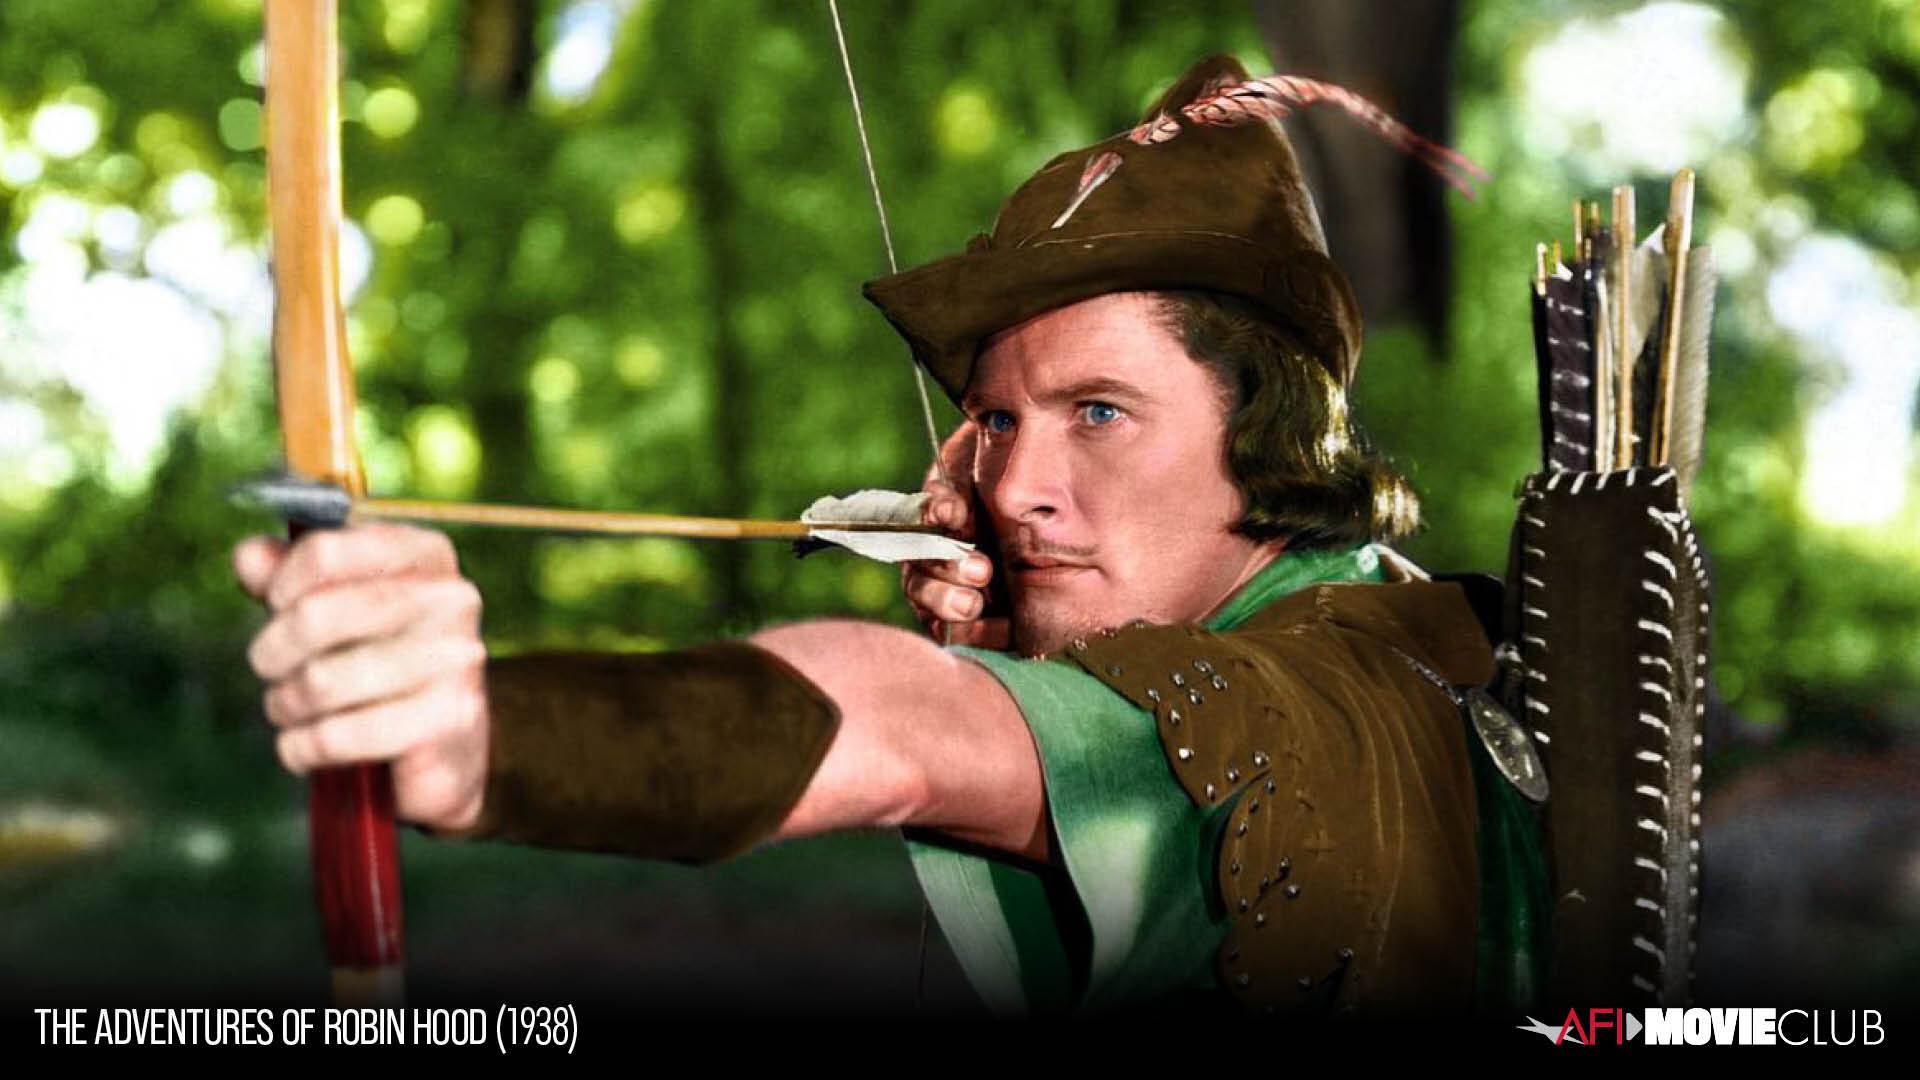 Errol Flynn as Robin Hood